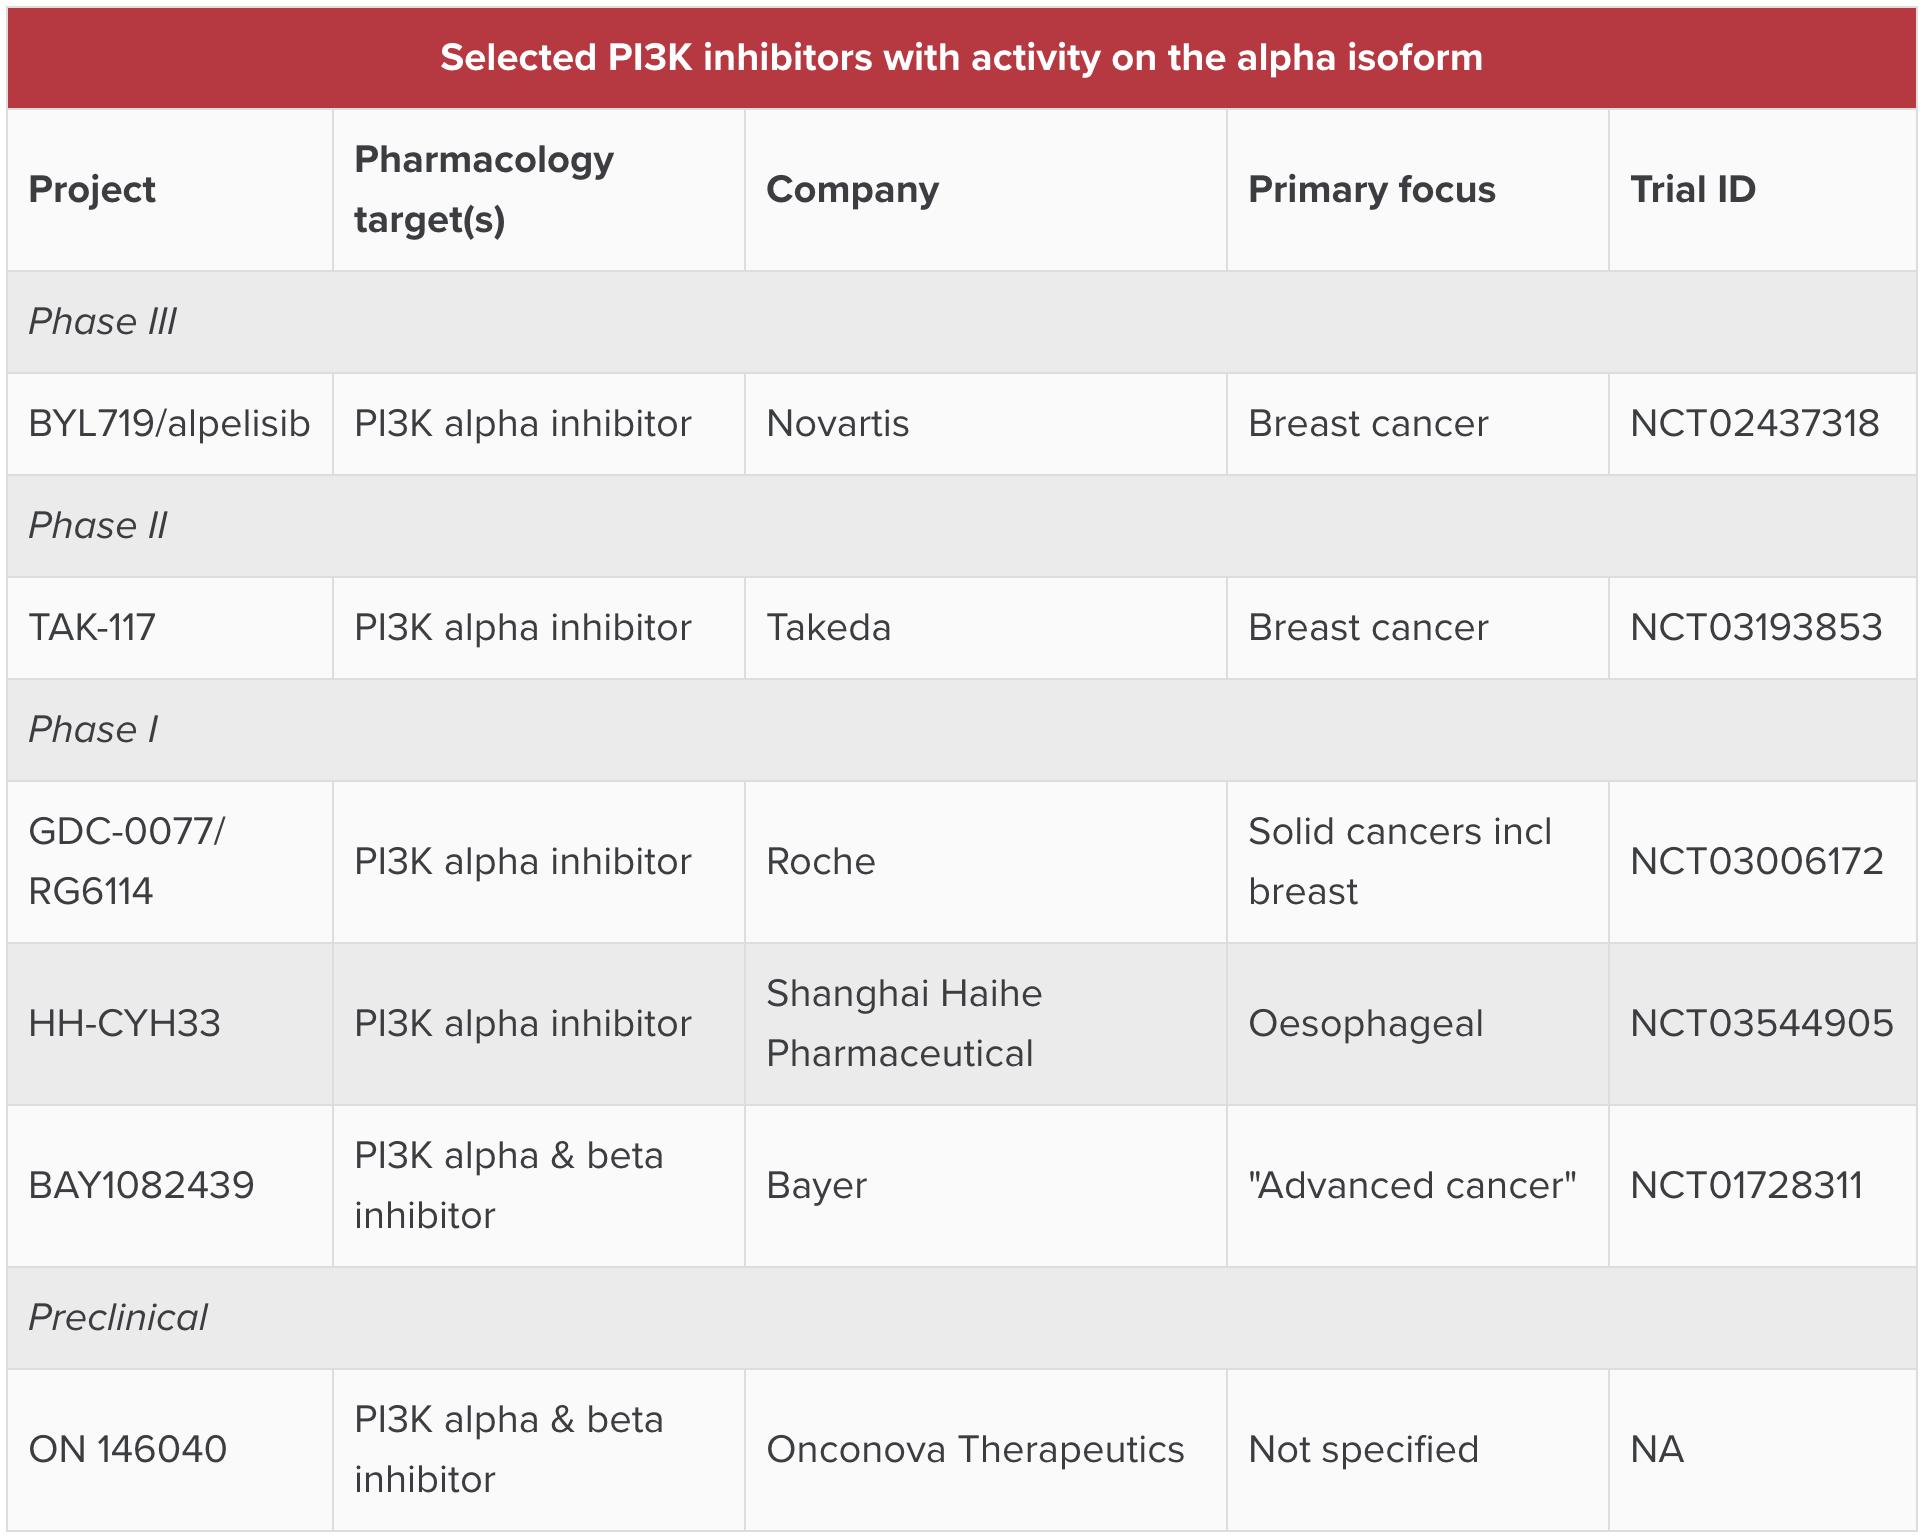 selected pi3k inhibitors with activity on the alpha isoform - Алпелисиб: против рака молочной железы с PIK3CA-мутациями